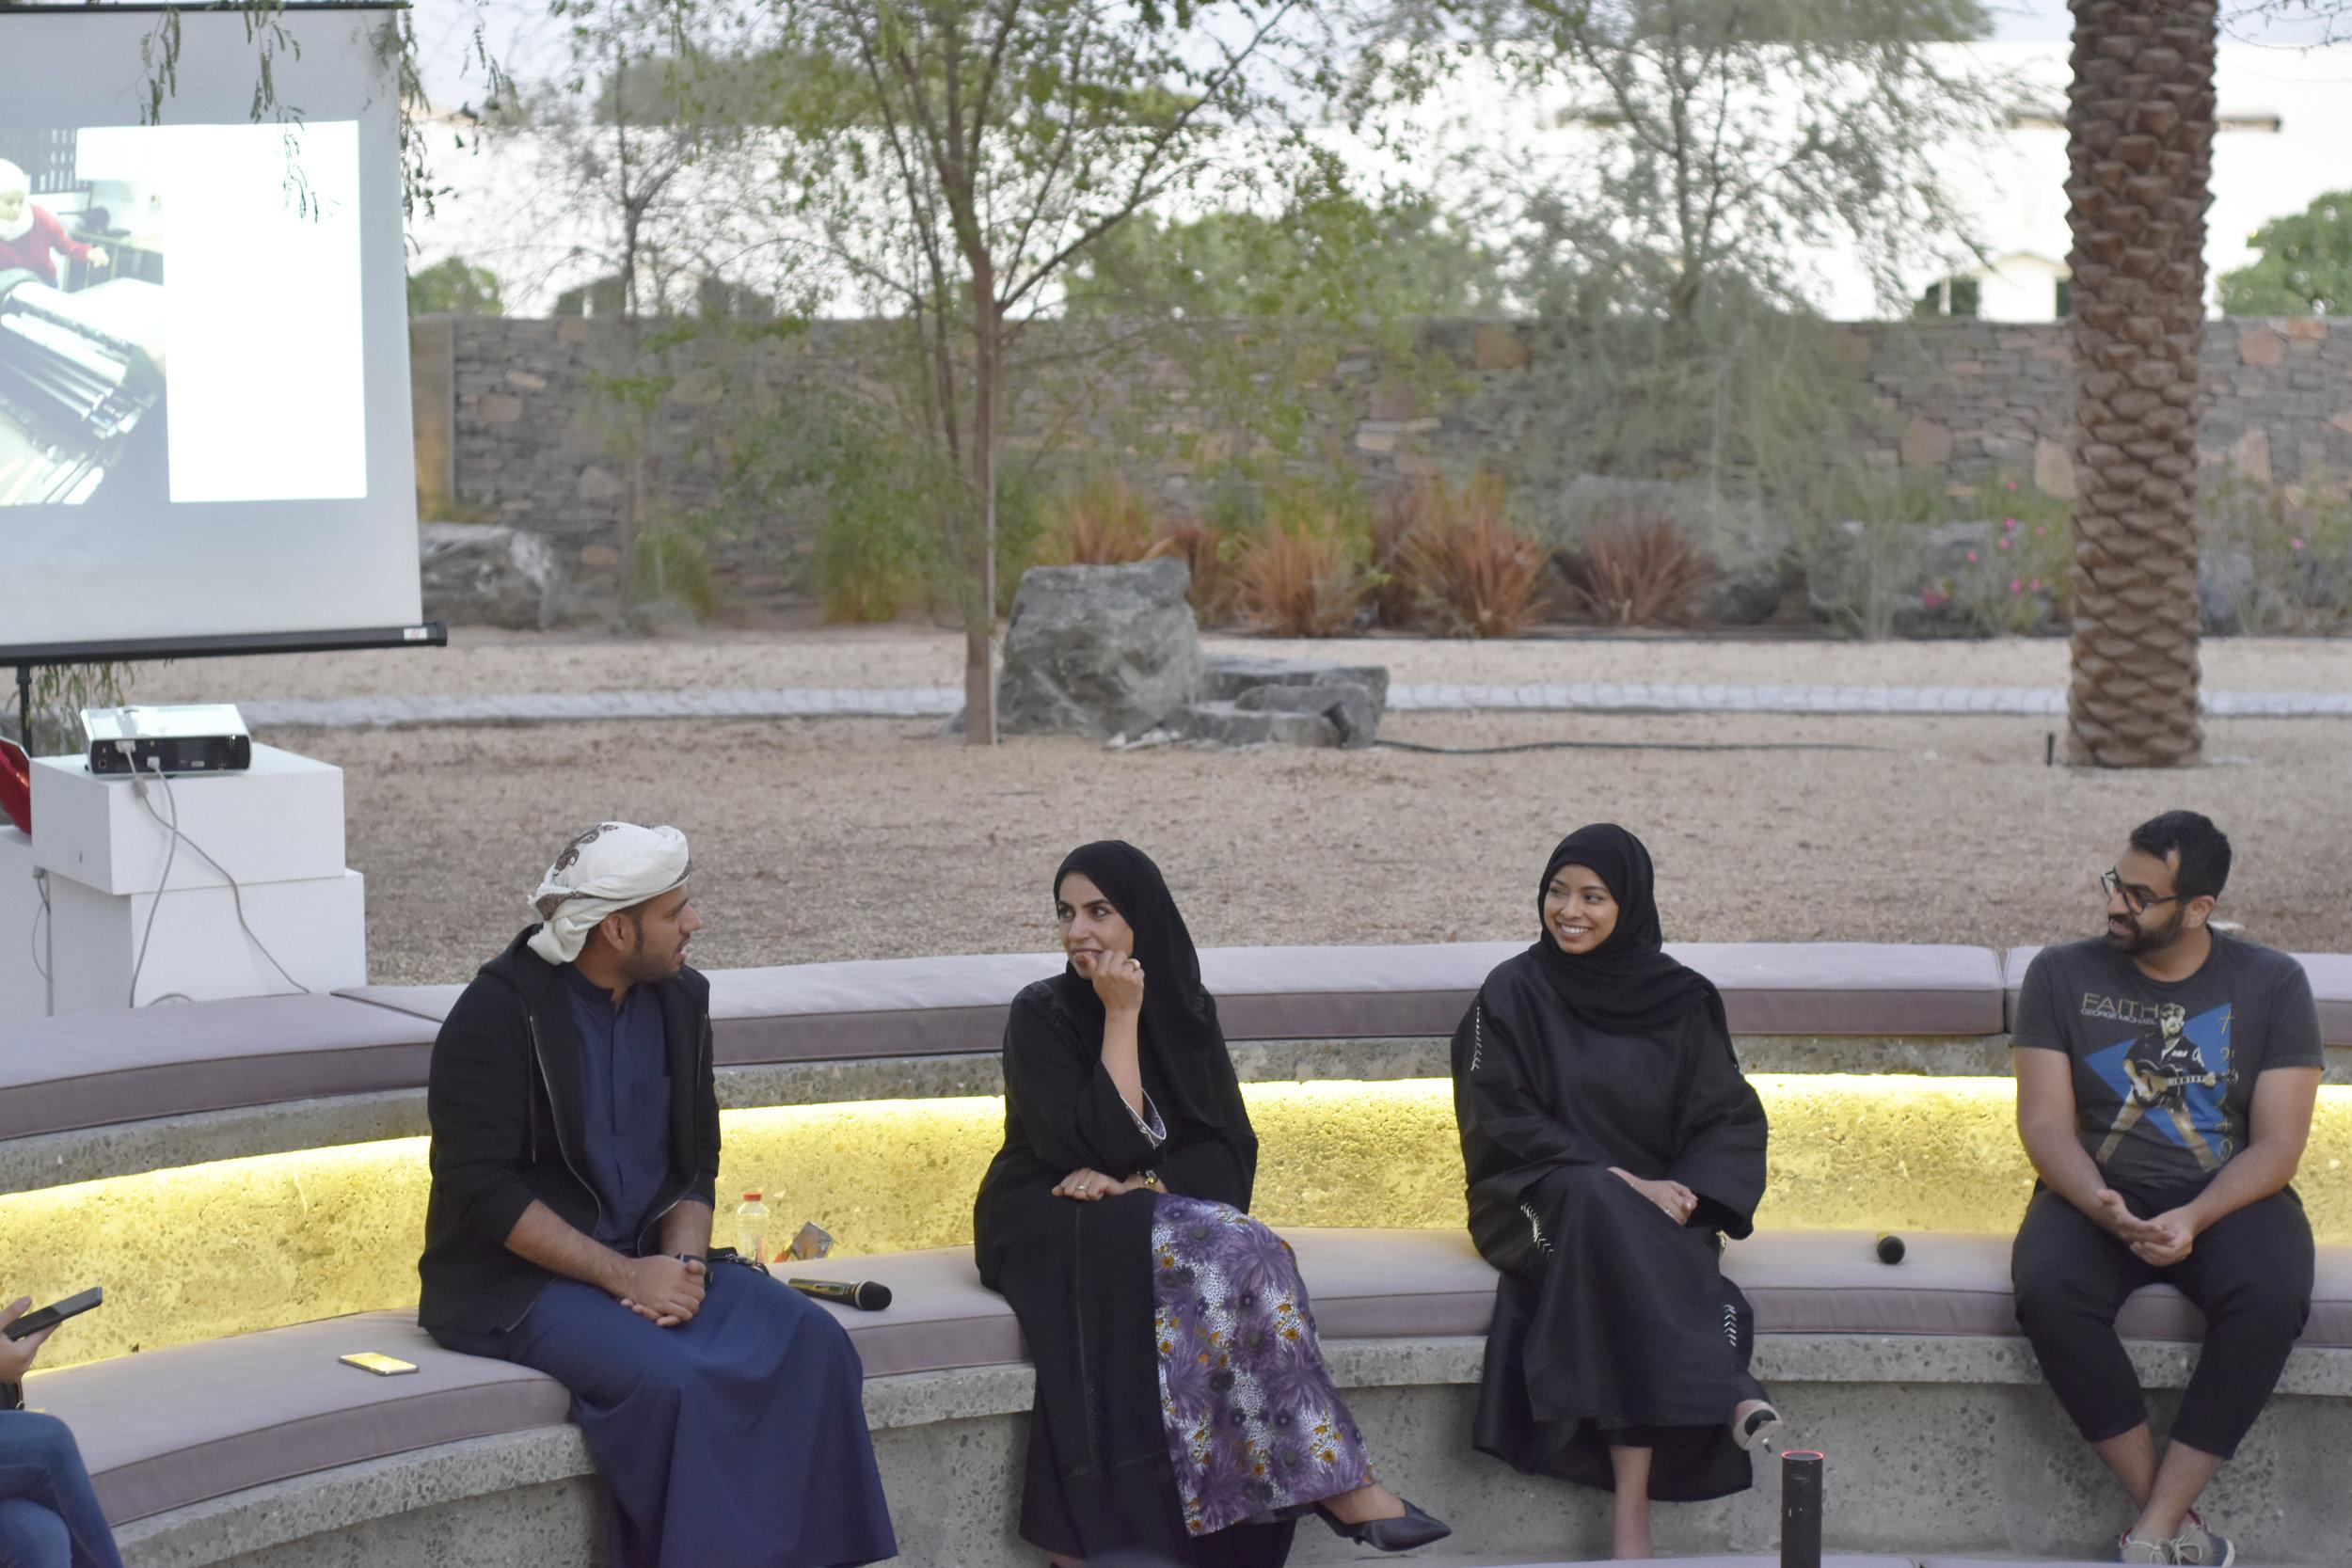 Tashkeel Talk with Saeed Al Madani, Dr. Karima Al Shomaly, Salama Nasib and Khalid Mezaina. Image courtesy of Tashkeel.jpg